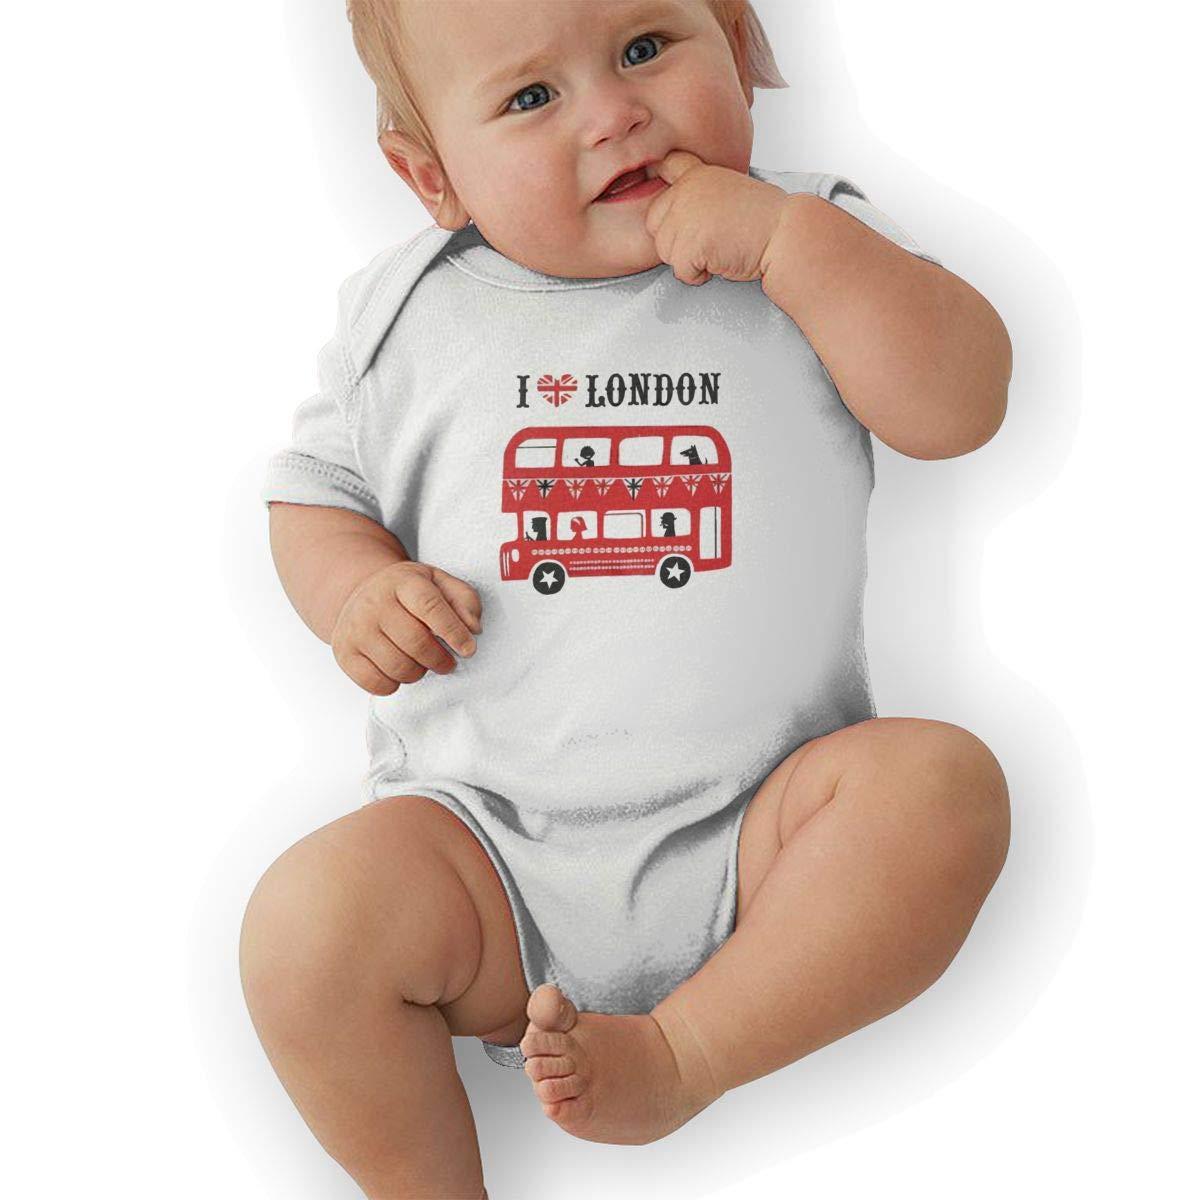 I Love London Baby Romper 0-18 Months Newborn Baby Girls Boys Layette Rompers Black